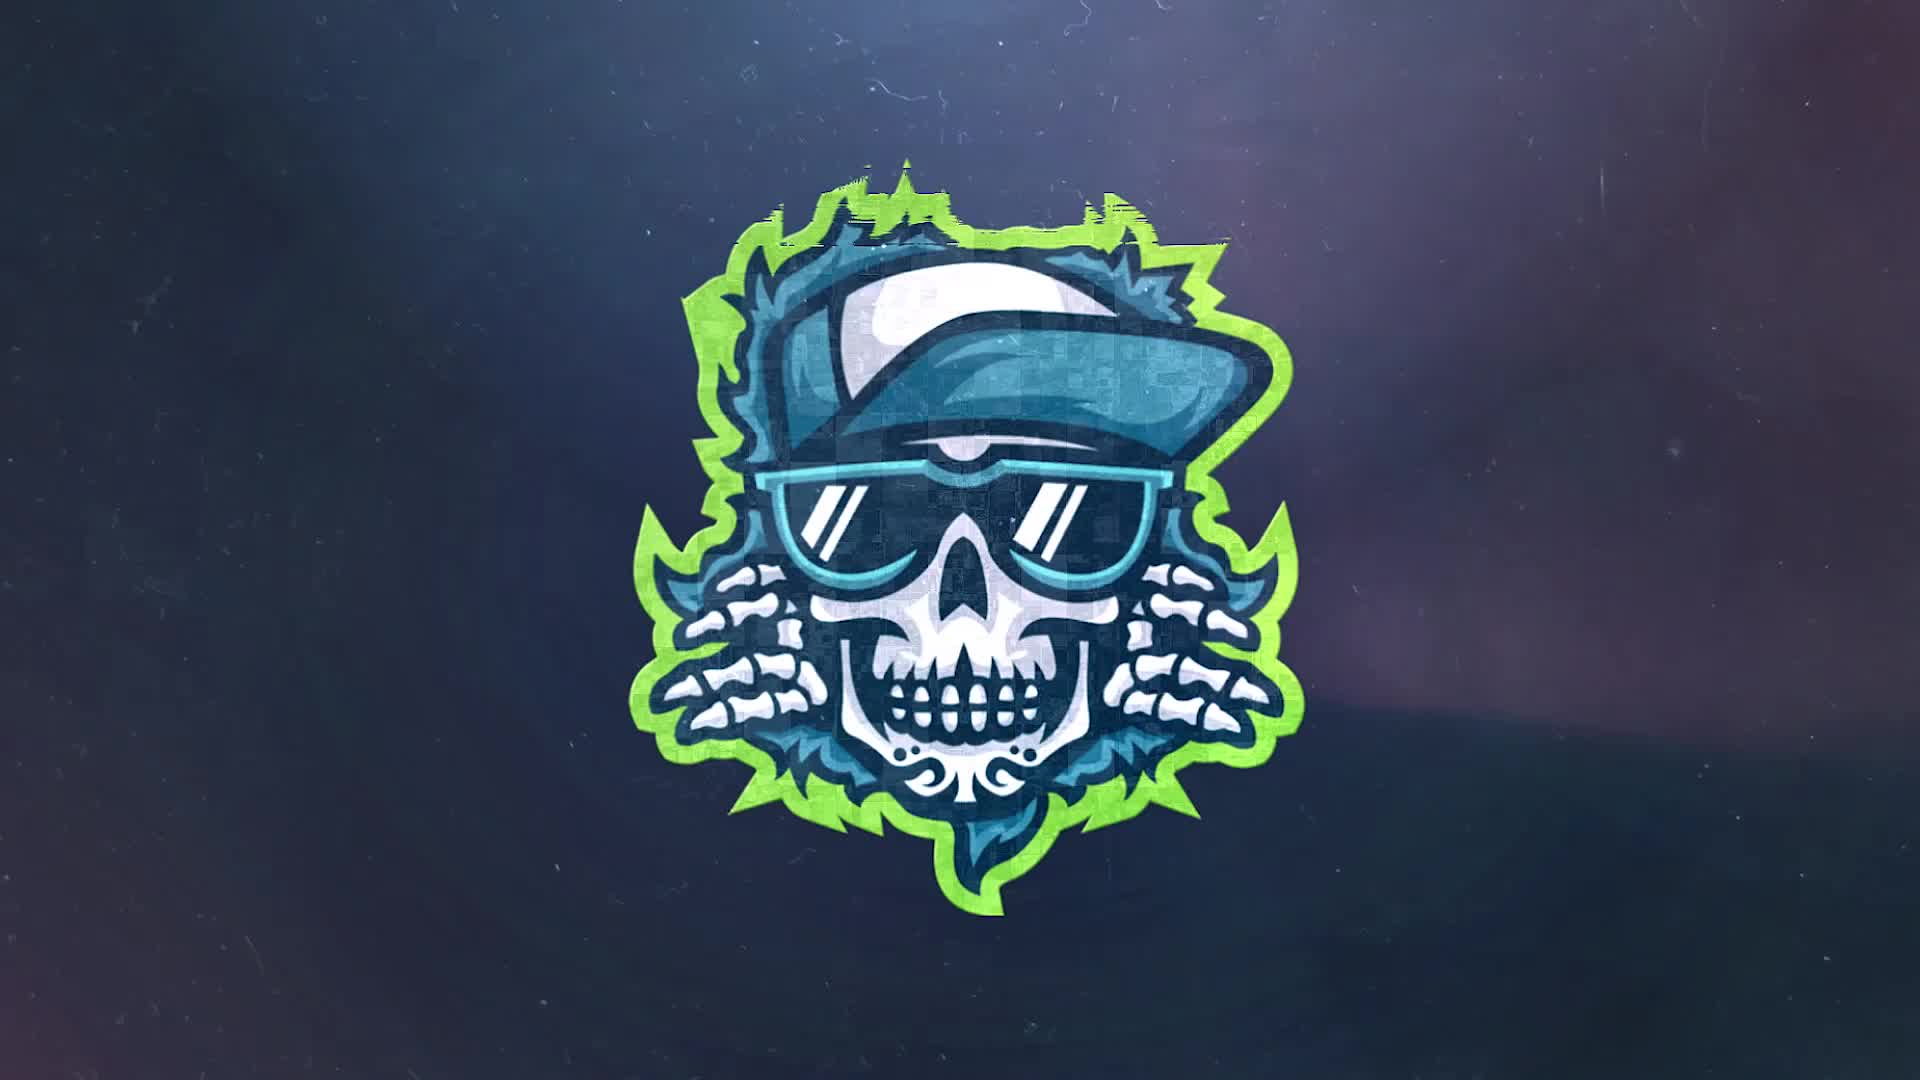 gaming, pcgaming, snowboard, snowboarding, snowthegame, Gettin Gangsta! GIFs